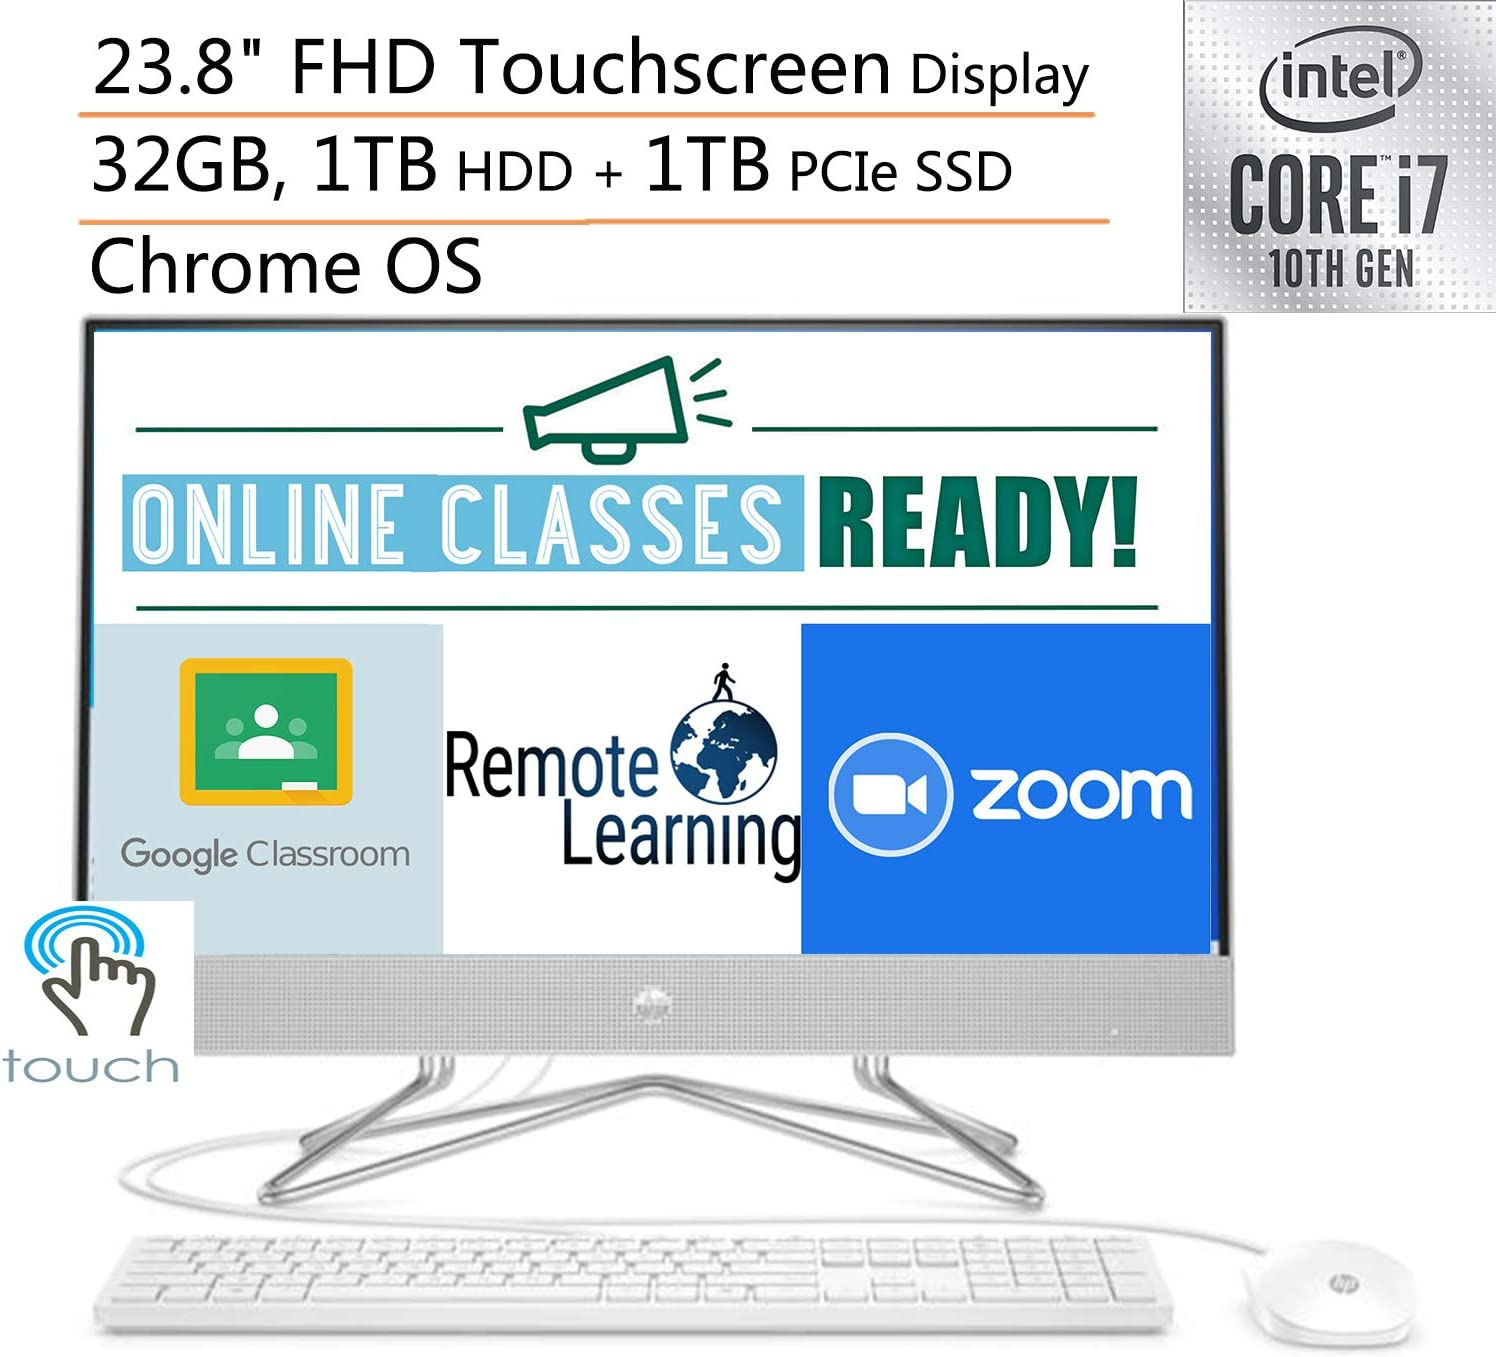 "2020 HP 24 AIO 23.8"" FHD Touchscreen All in One Desktop Computer, 10th Gen Intel Quard-Core i7-10510U, 32GB DDR4 RAM, 1TB HDD + 1TB PCIe SSD, Windows 10, iPuzzle Mousepad, Online Class Ready"